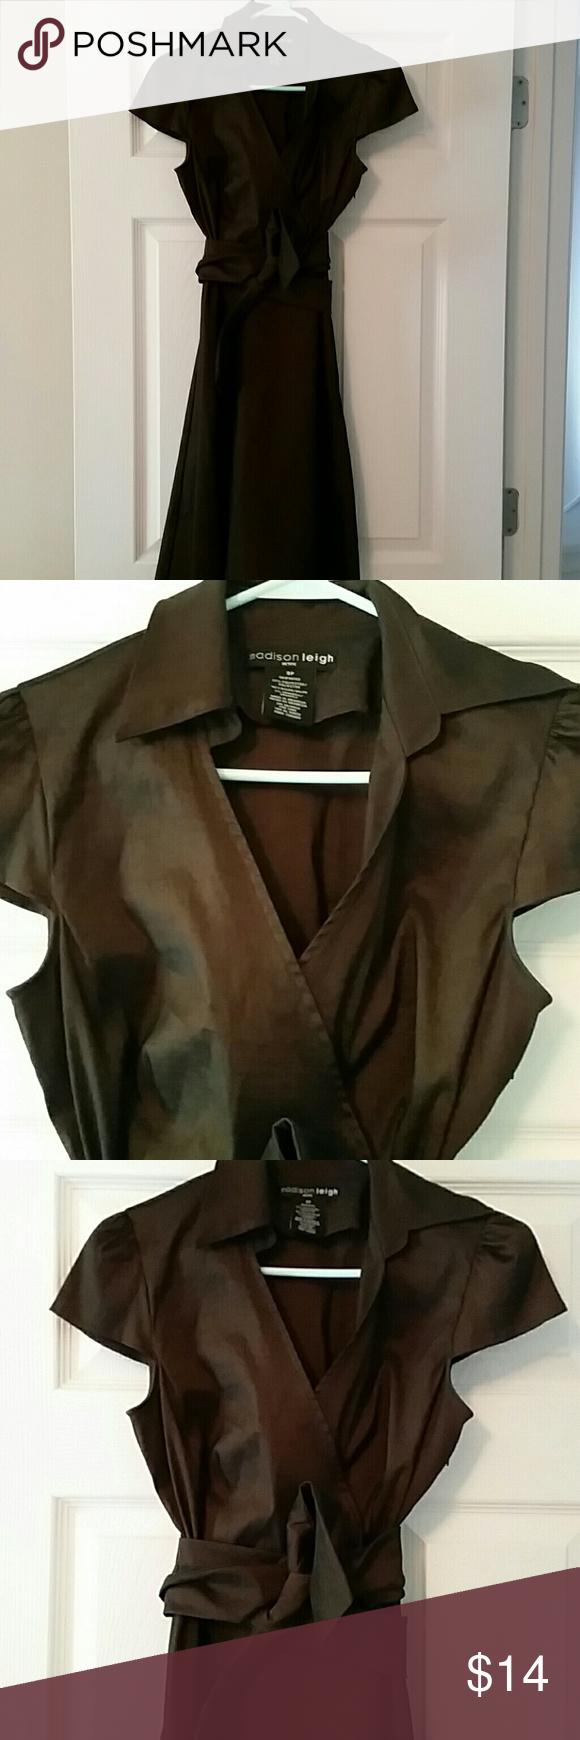 Madison leigh dark brown dress sleeve zippers and dark brown